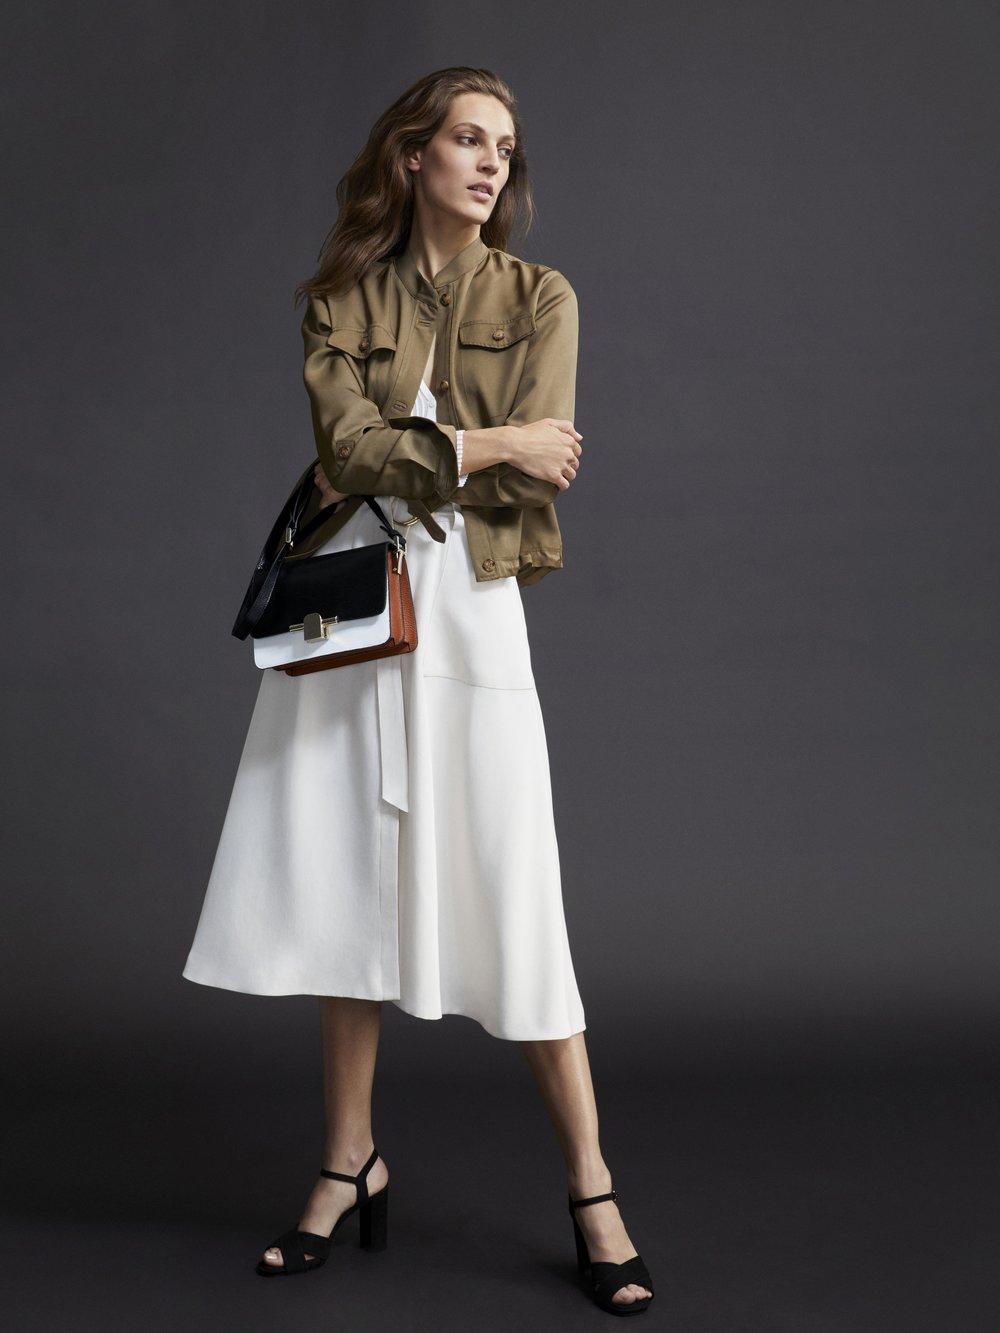 Massimo Dutti_The Iconic Bag (8).jpg